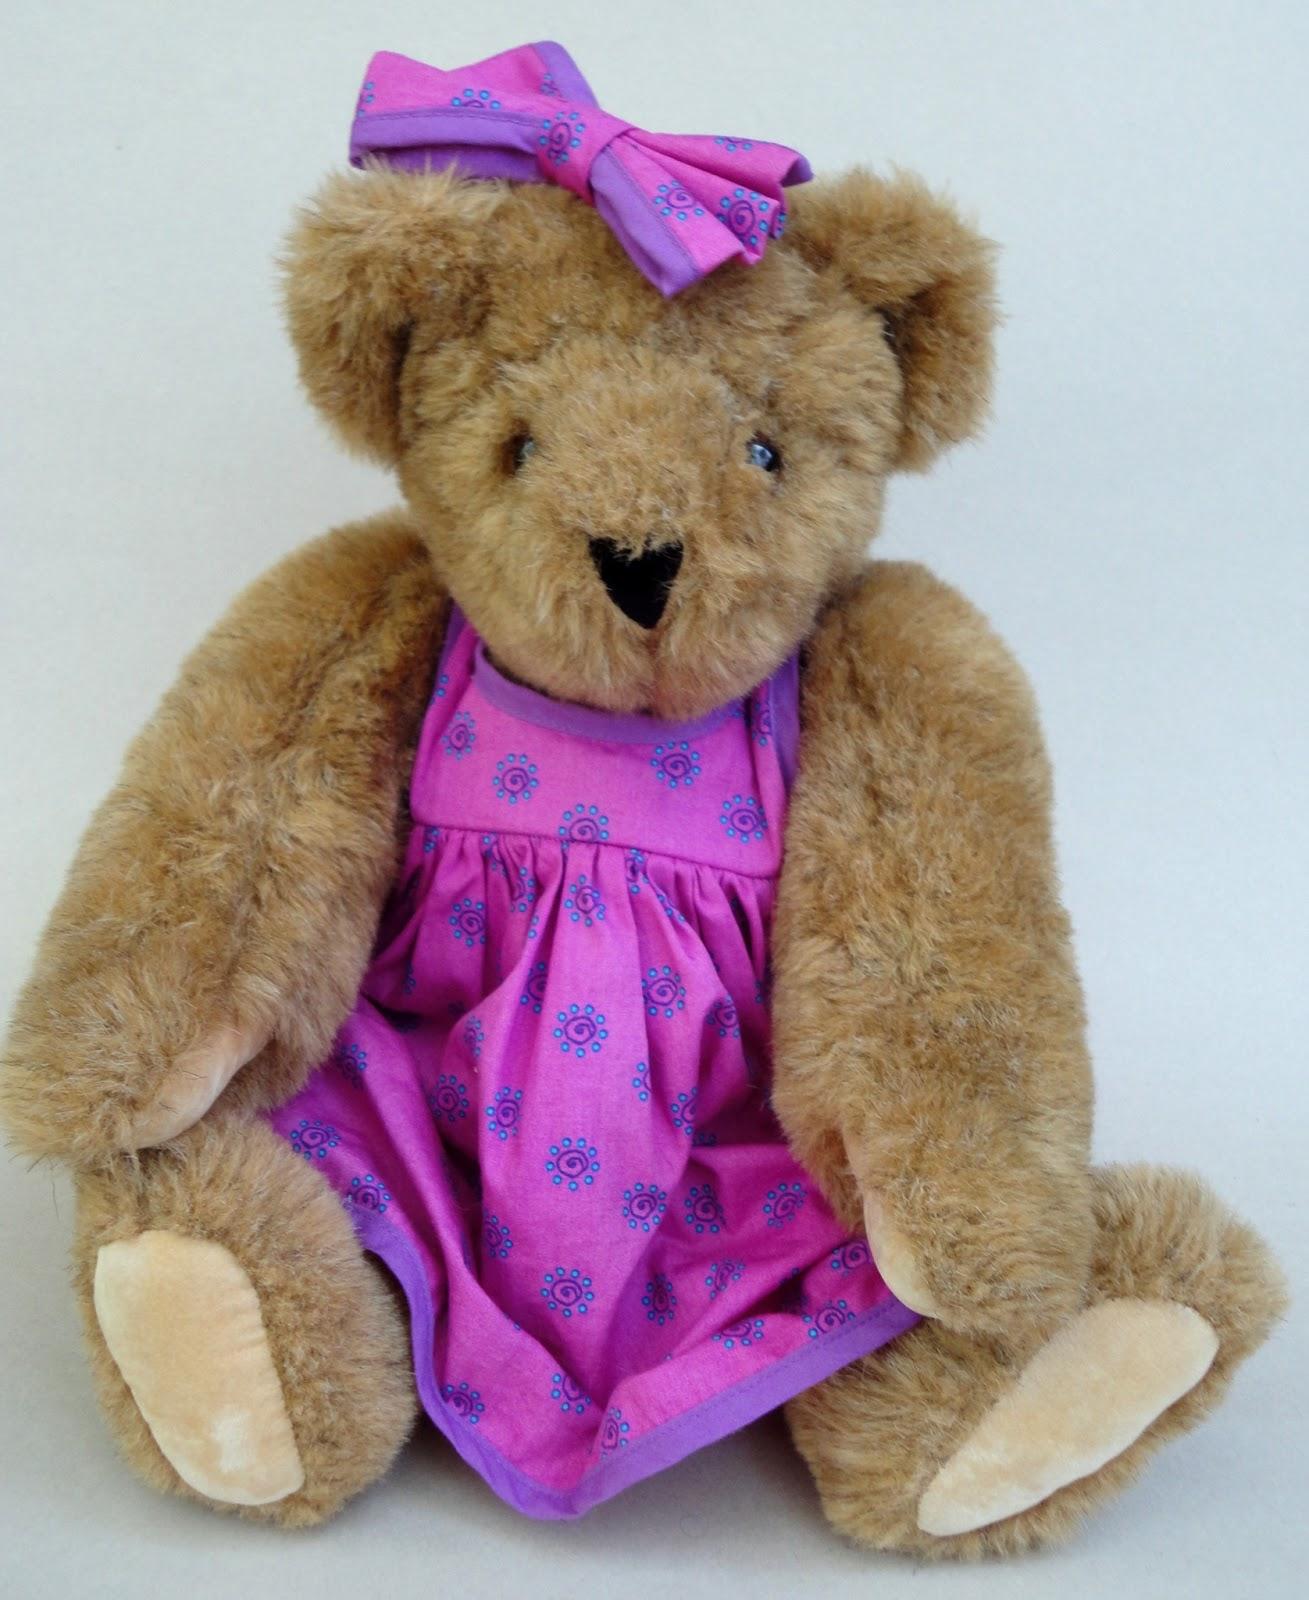 The Vermont Teddy Bear & Victoria's Secret Dogs | Mandicrafts News